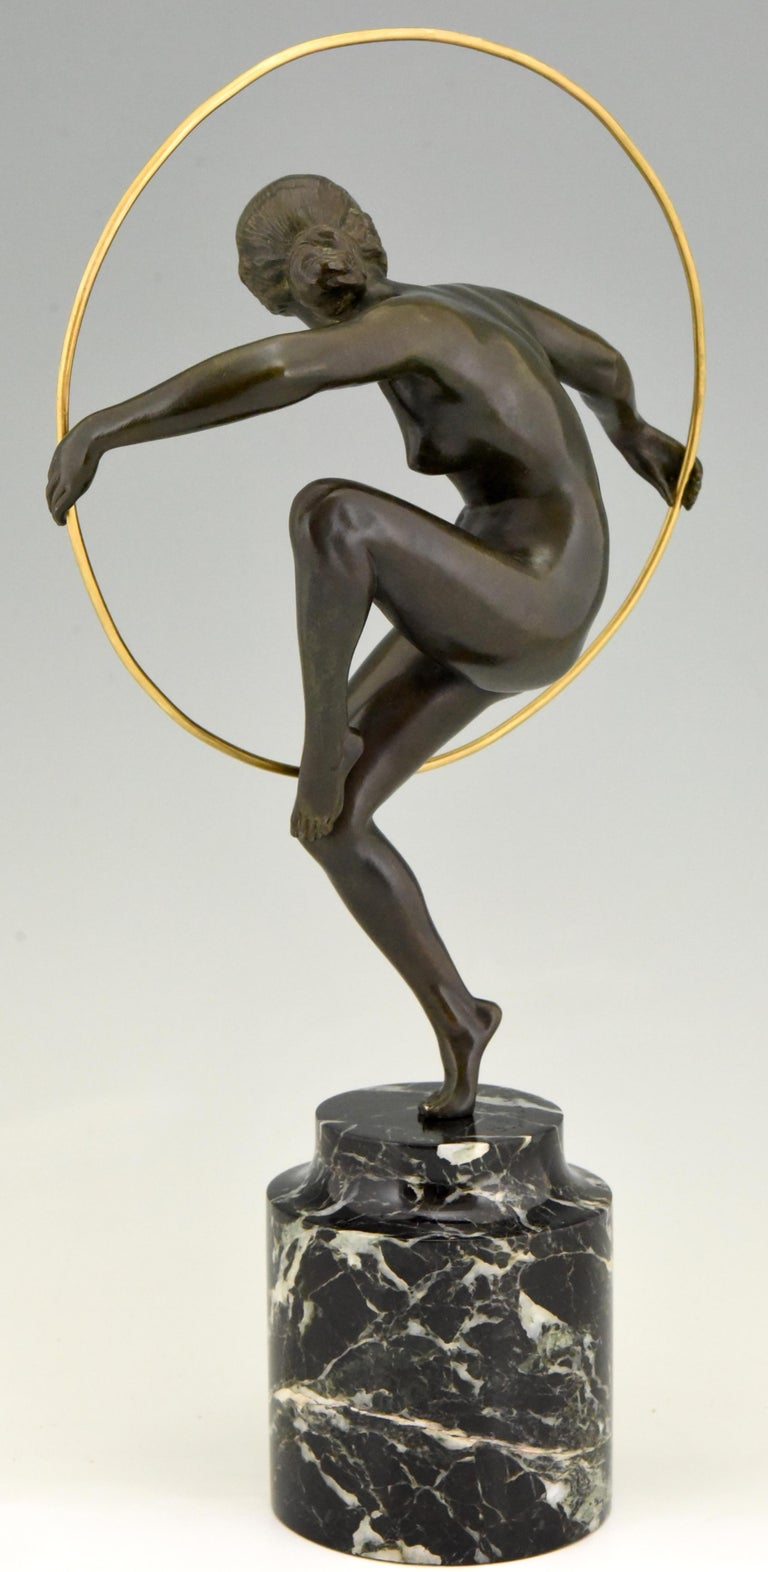 Mid-20th Century Art Deco Bronze Nude Hoop Dancer Andre Marcel Bouraine, 1930, France For Sale